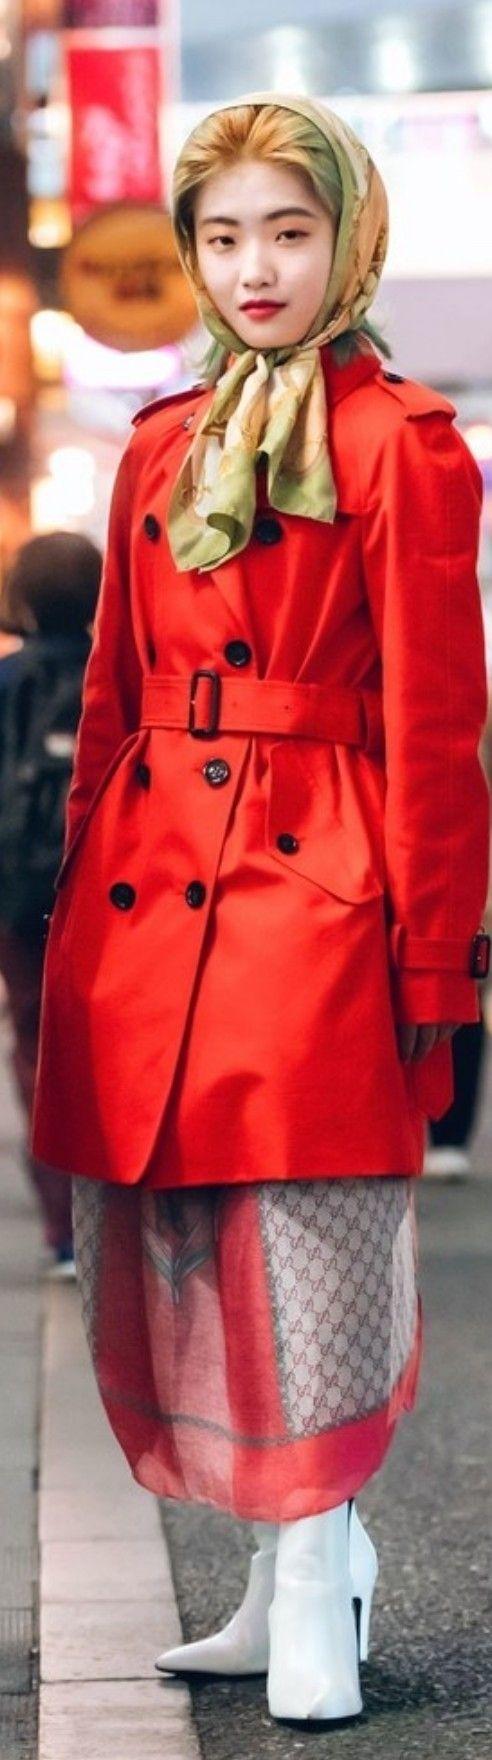 Tokyo Fashion Week 2019. Photog - sweetlightheart | ello